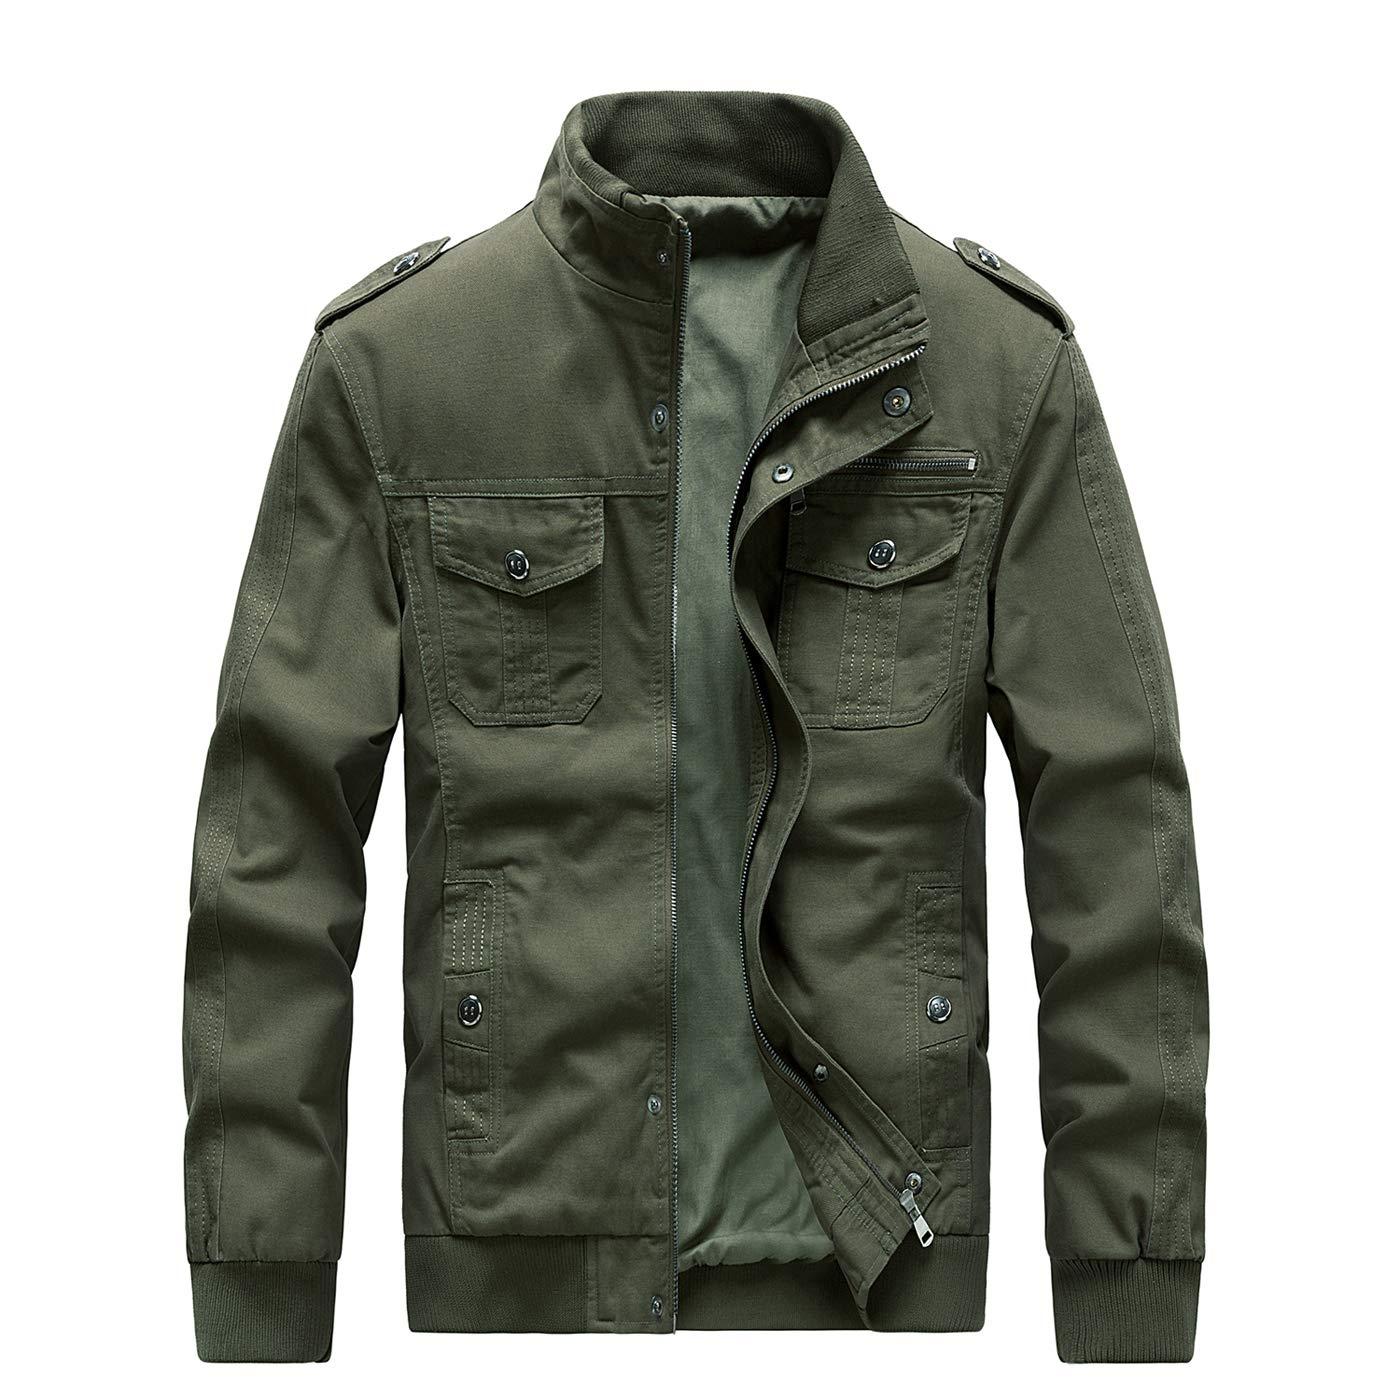 ZooYung Men's Casual Winter Cotton Military Jackets Outdoor Coat Windproof Windbreaker(GM-ZY812-Green-S) by ZooYung